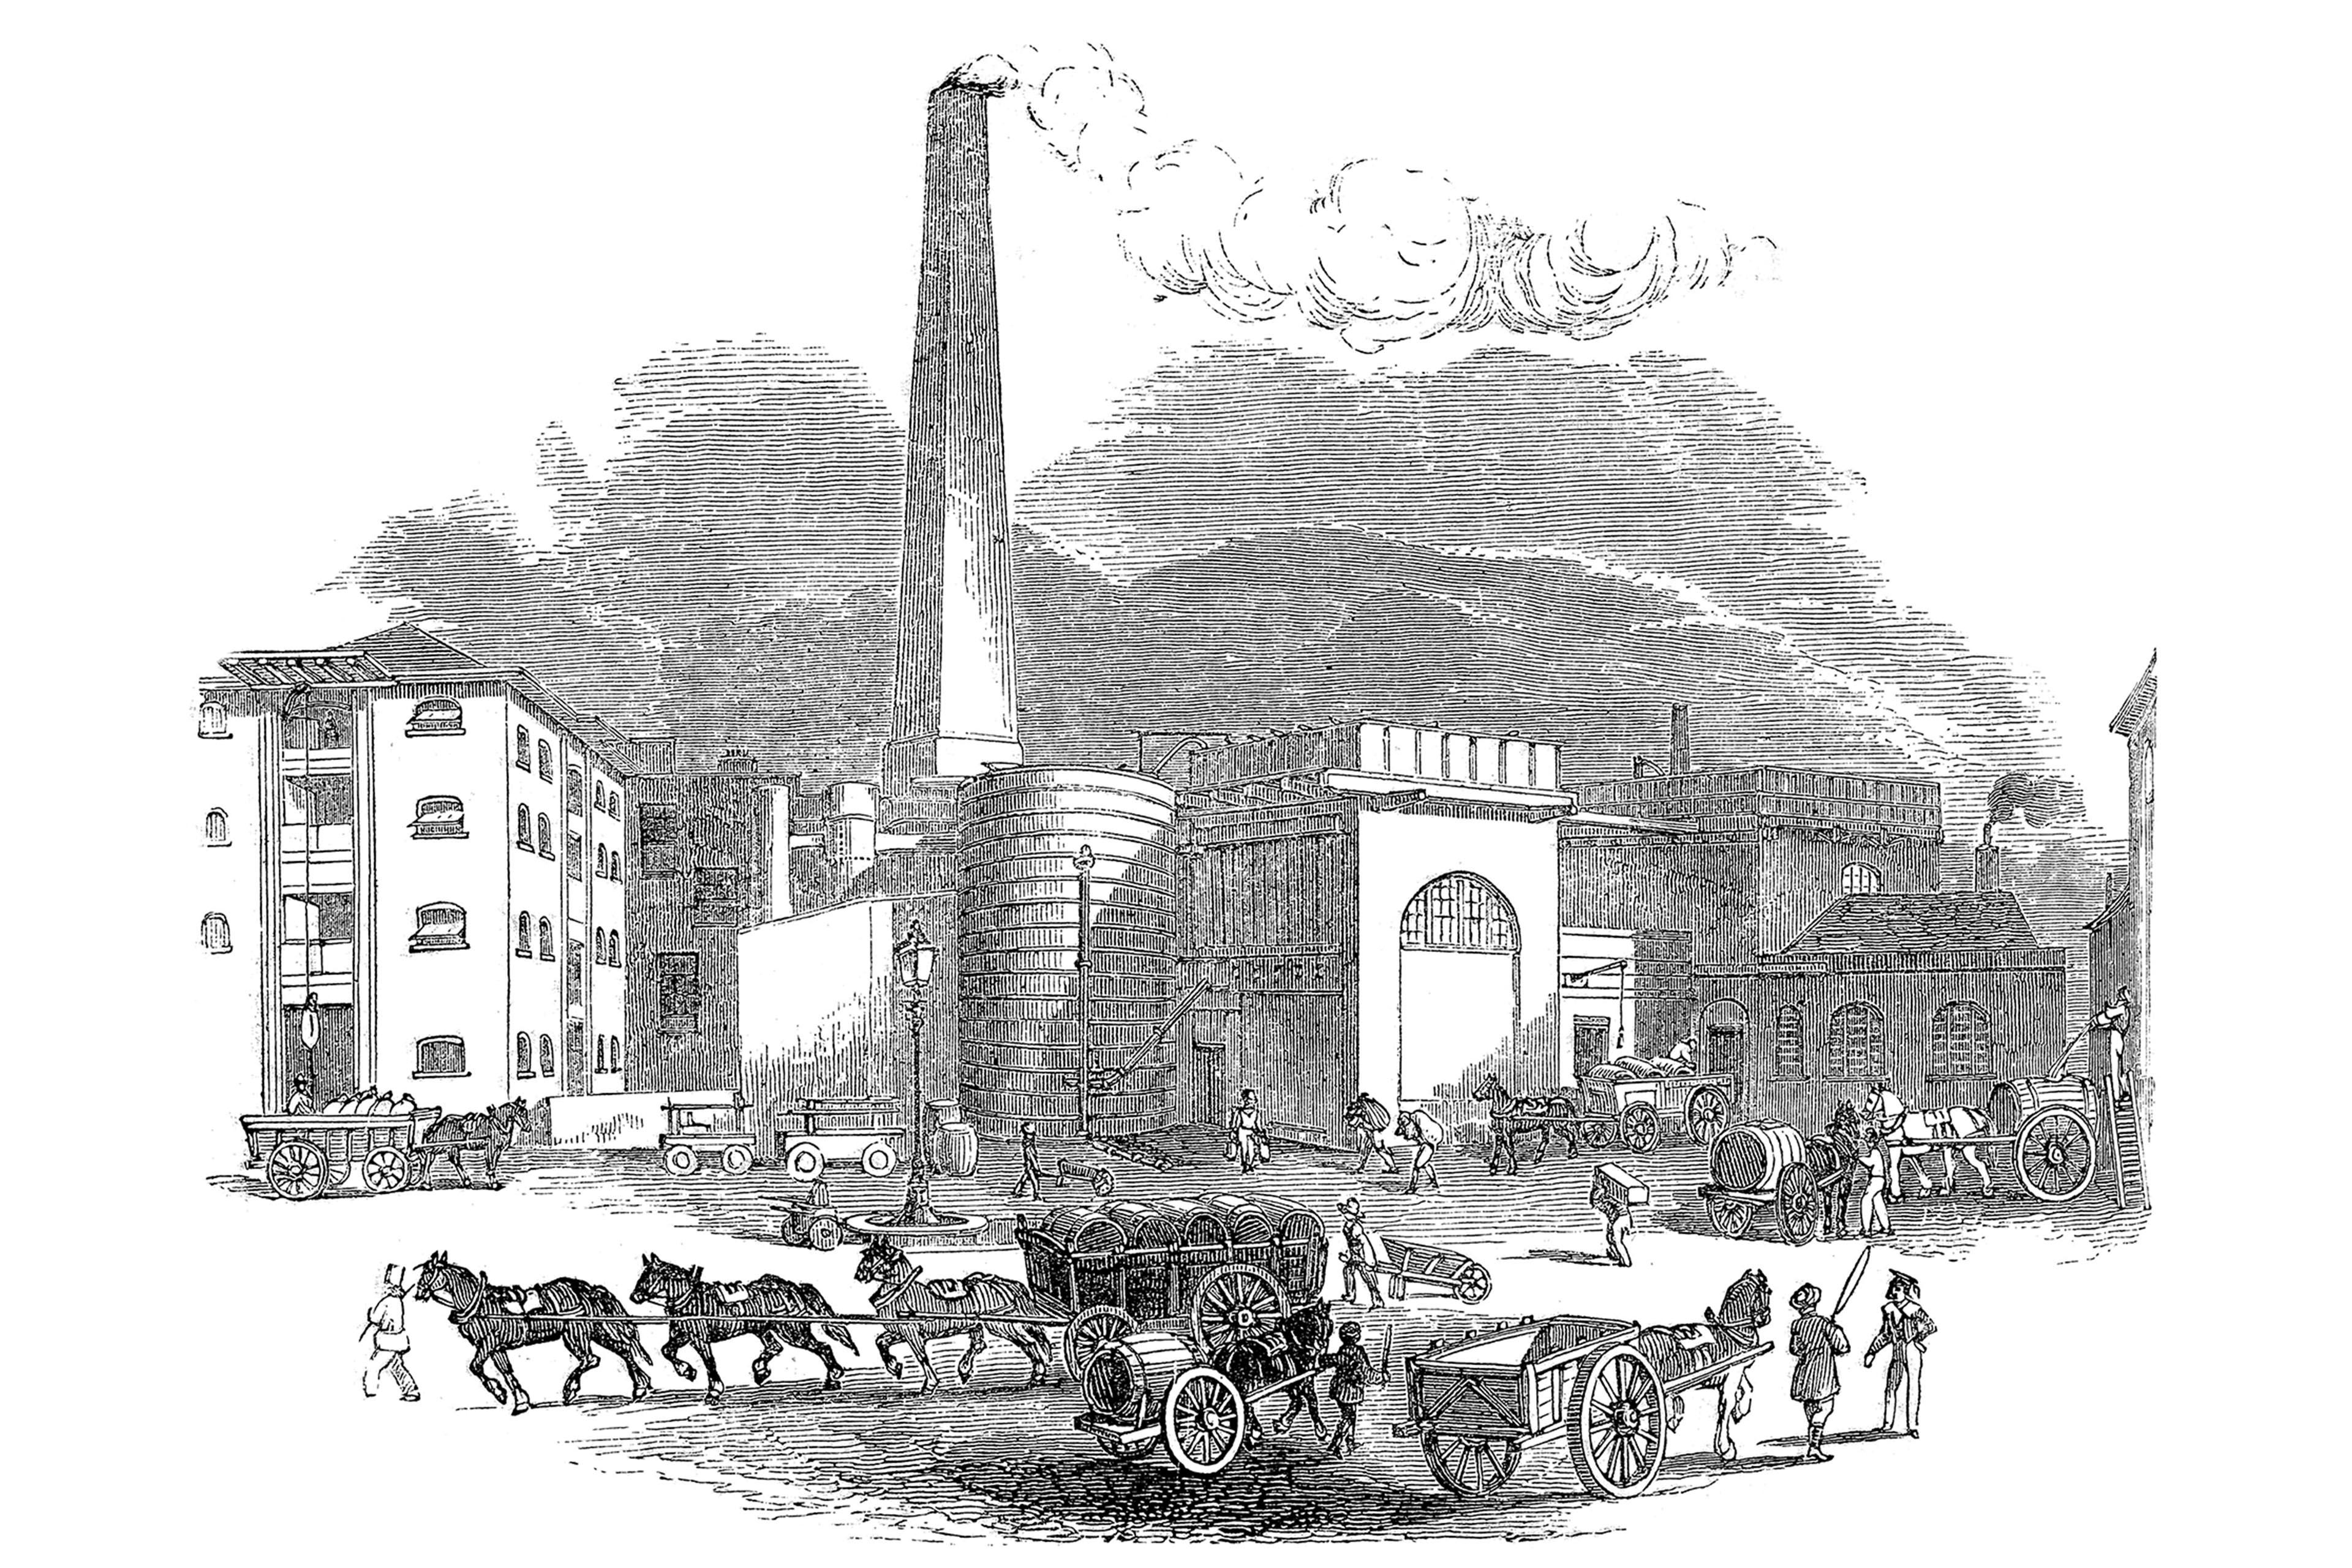 Single malt whisky distillery Thames Bank London